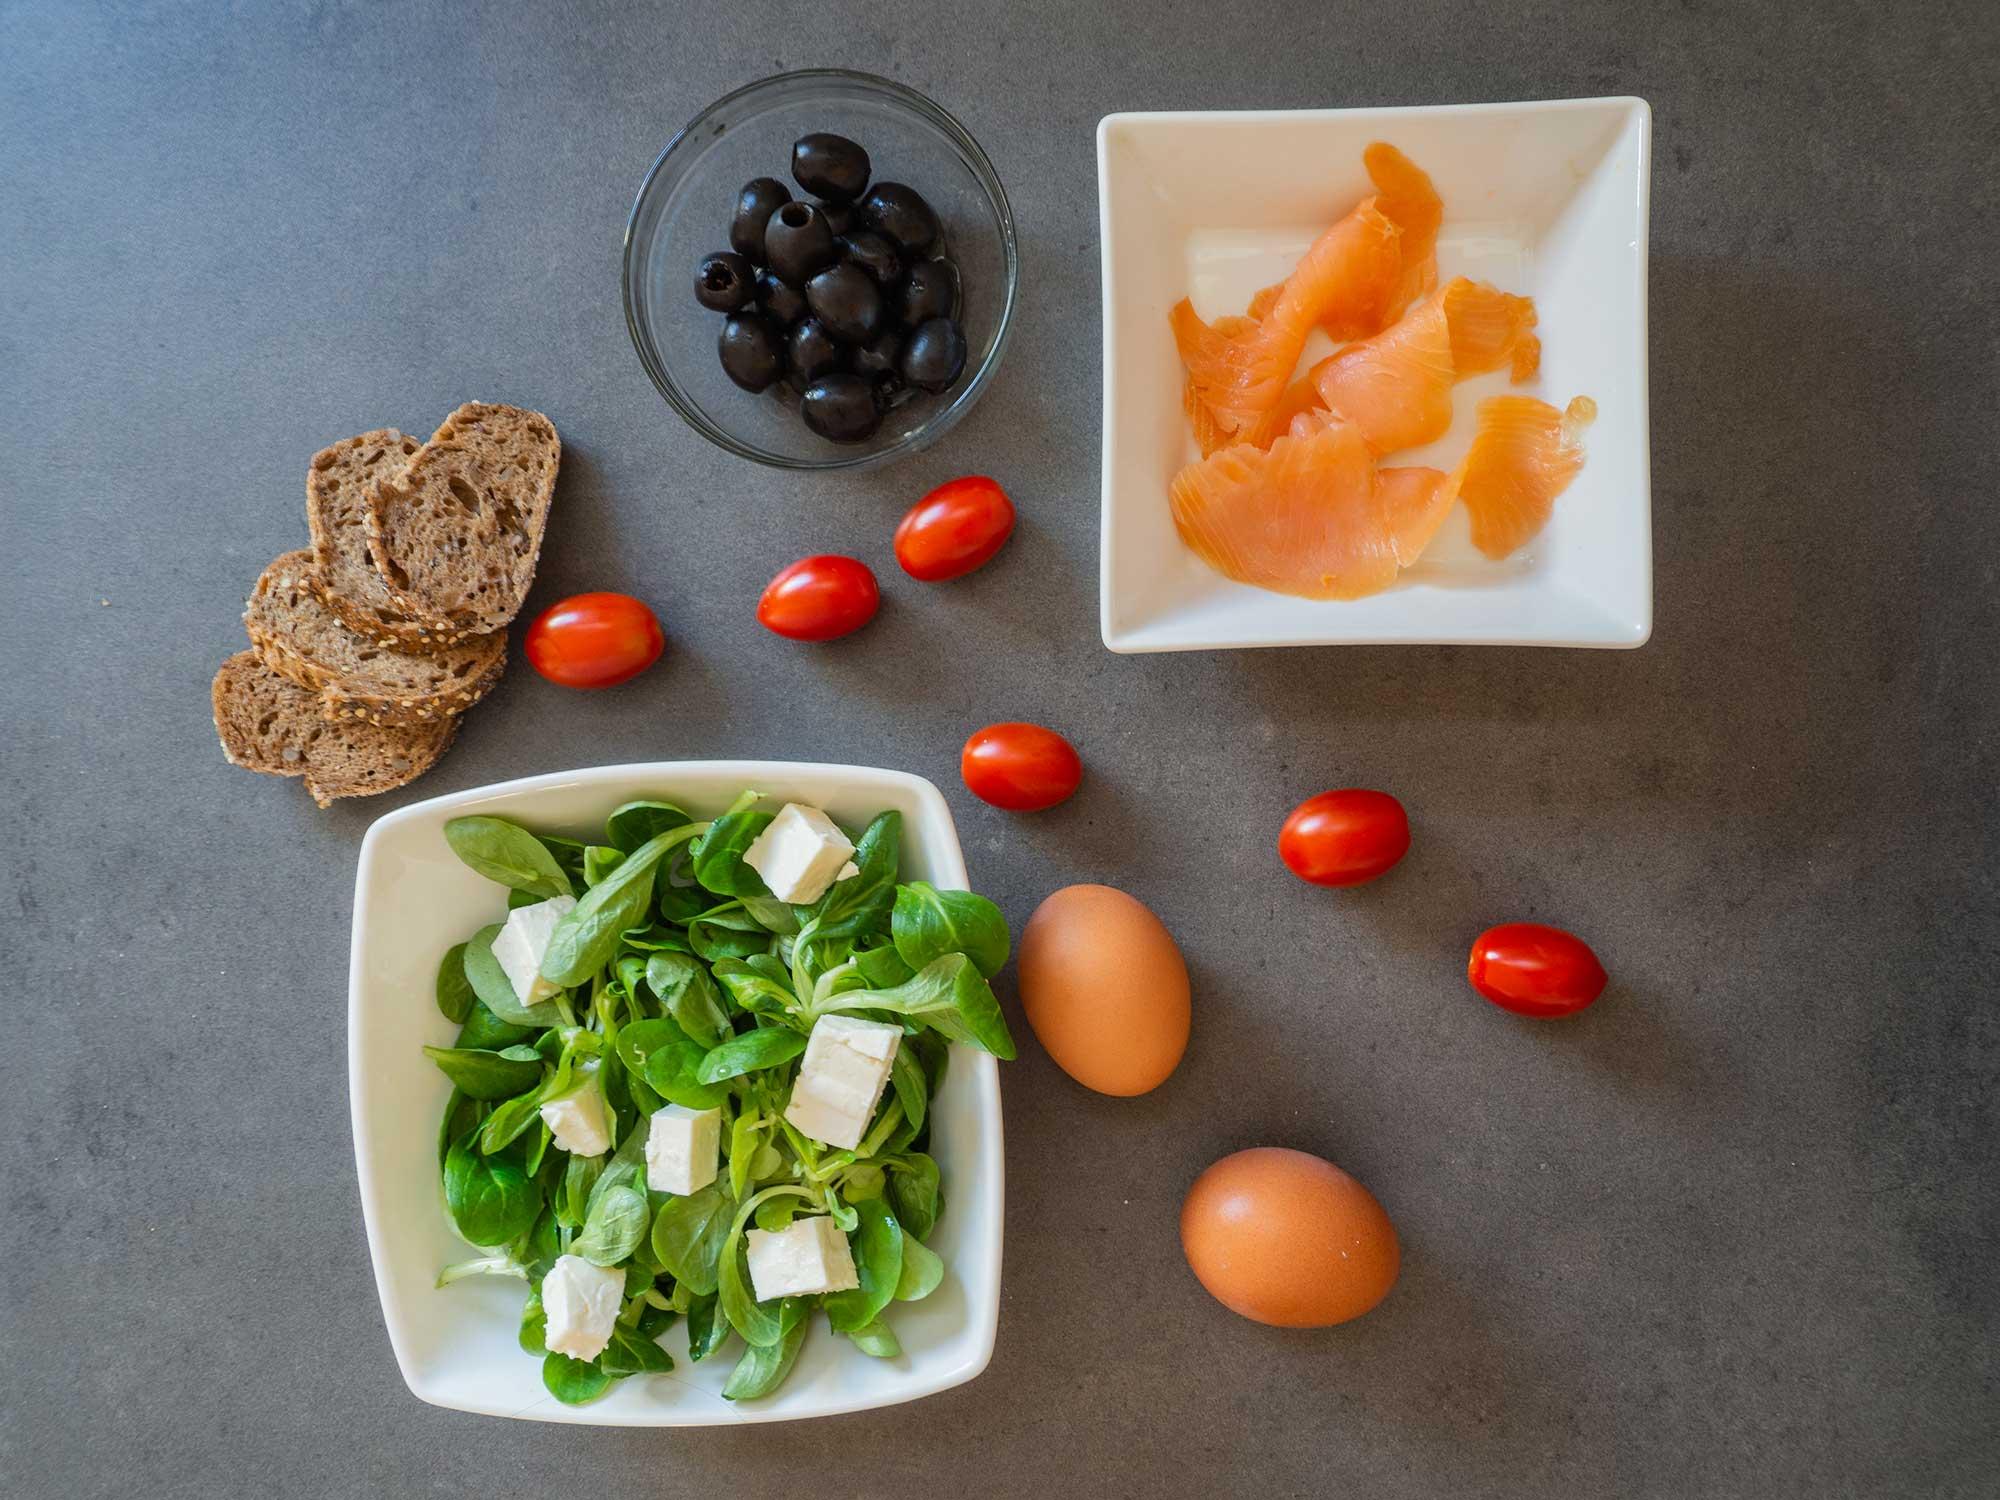 salmon, bread, eggs, tomatoes, feta